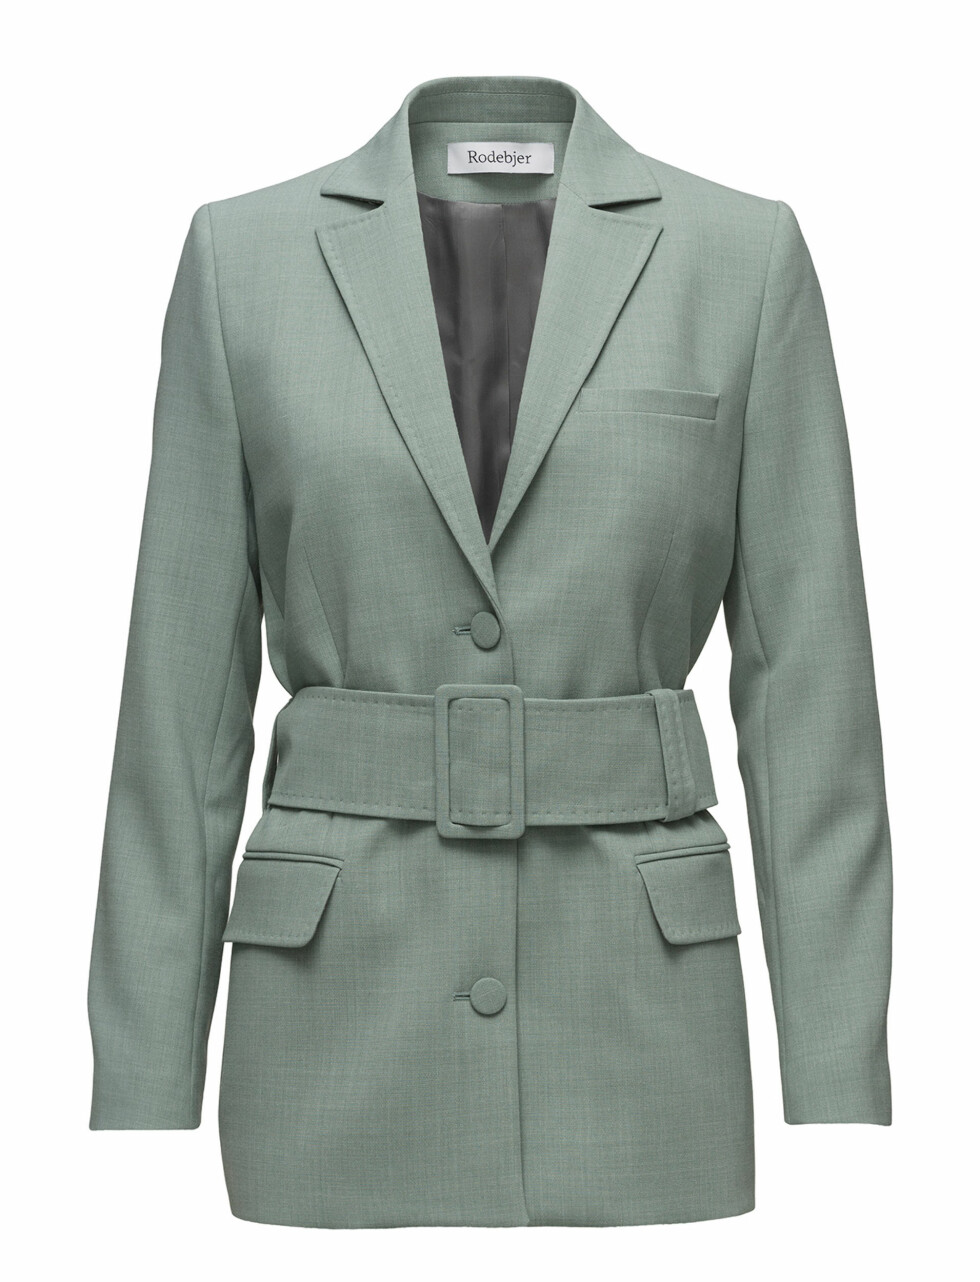 Dressjakke fra Rodebjer via Boozt.com  4295,-  https://www.boozt.com/no/no/rodebjer/anitalia-suit_16668318/16668323?navId=67743&group=listing&position=1500000